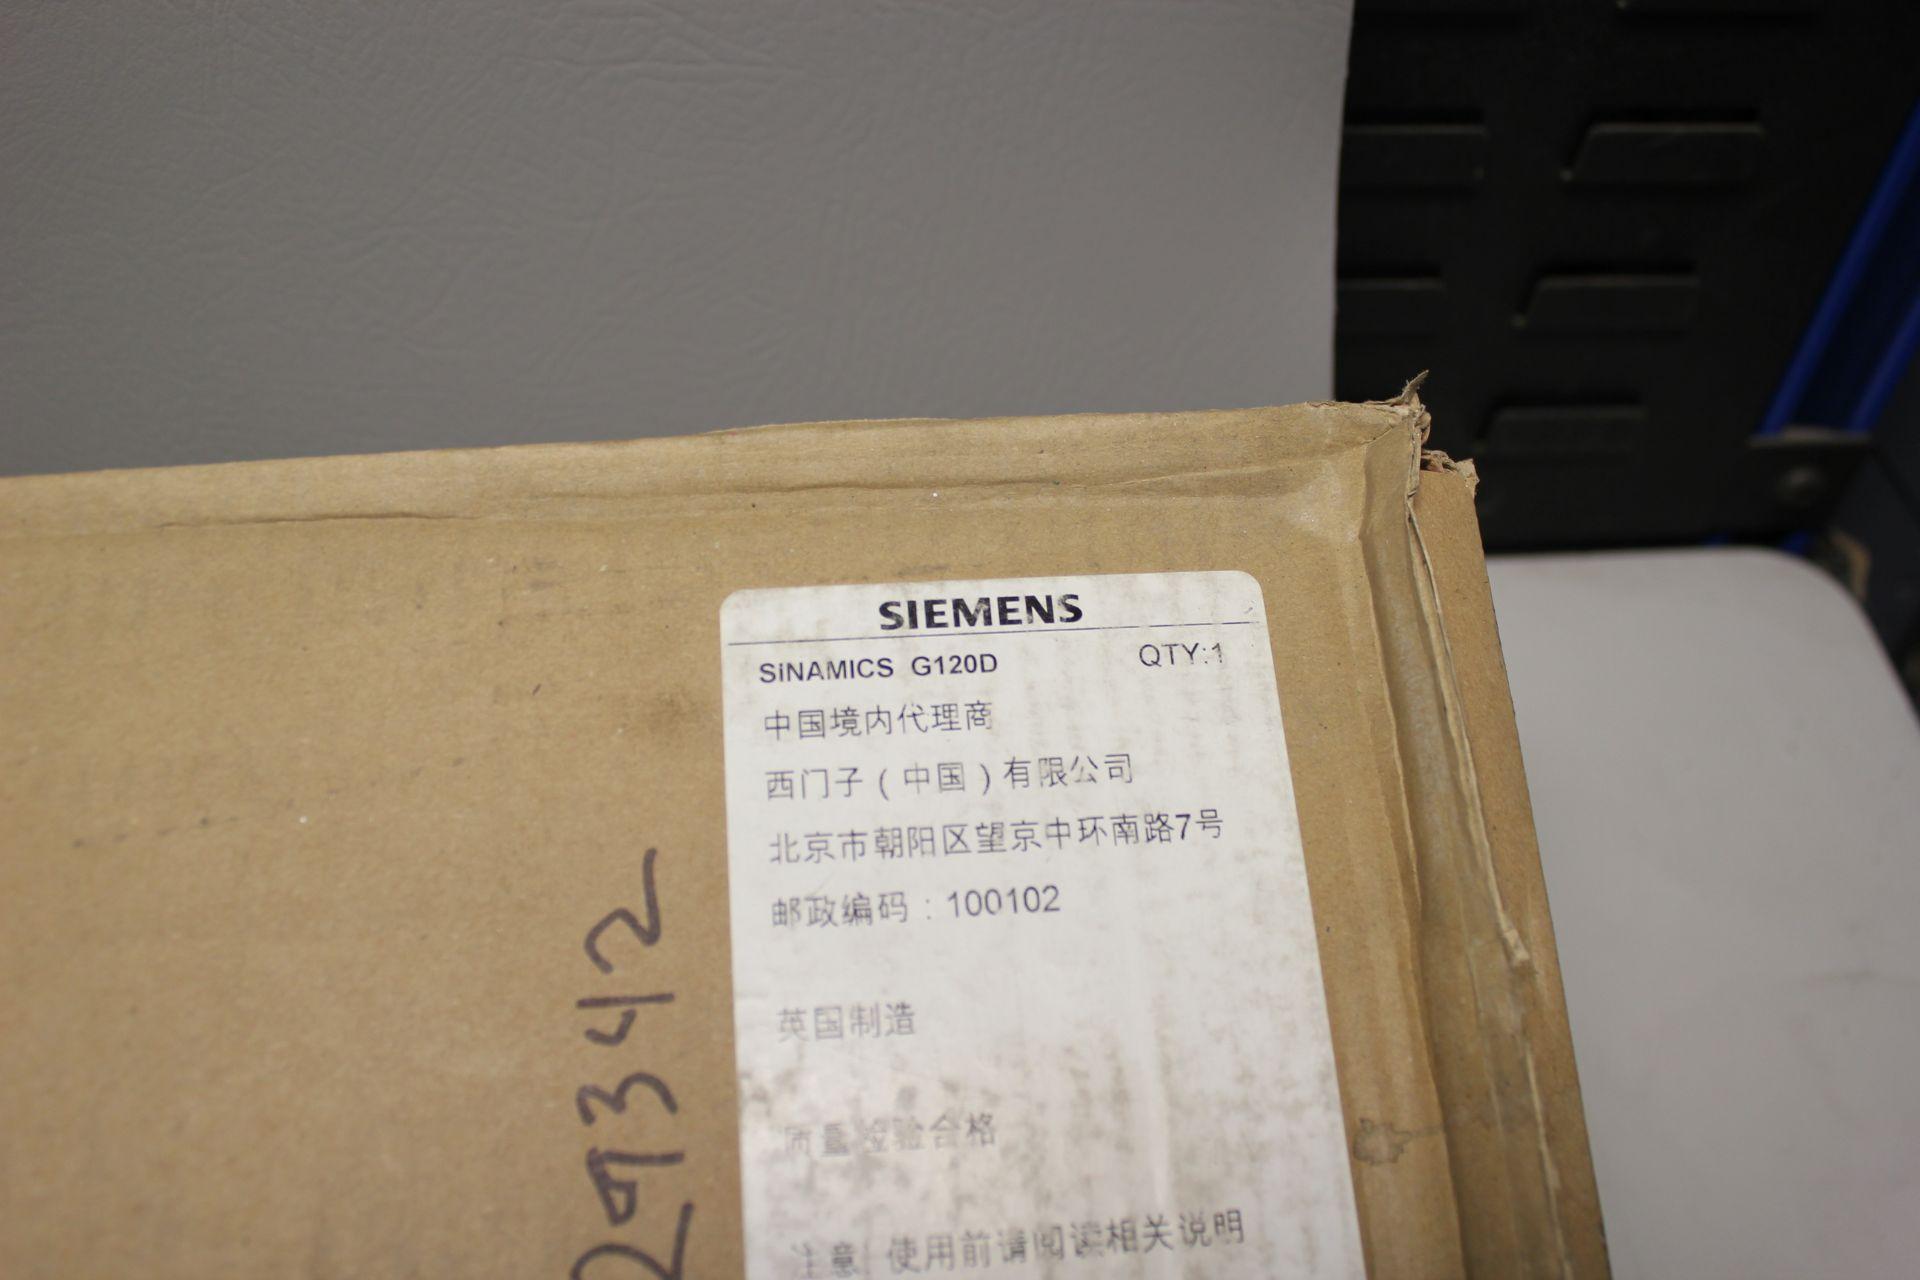 NEW SIEMENS SINAMICS G120D POWER MODULE - Image 2 of 6